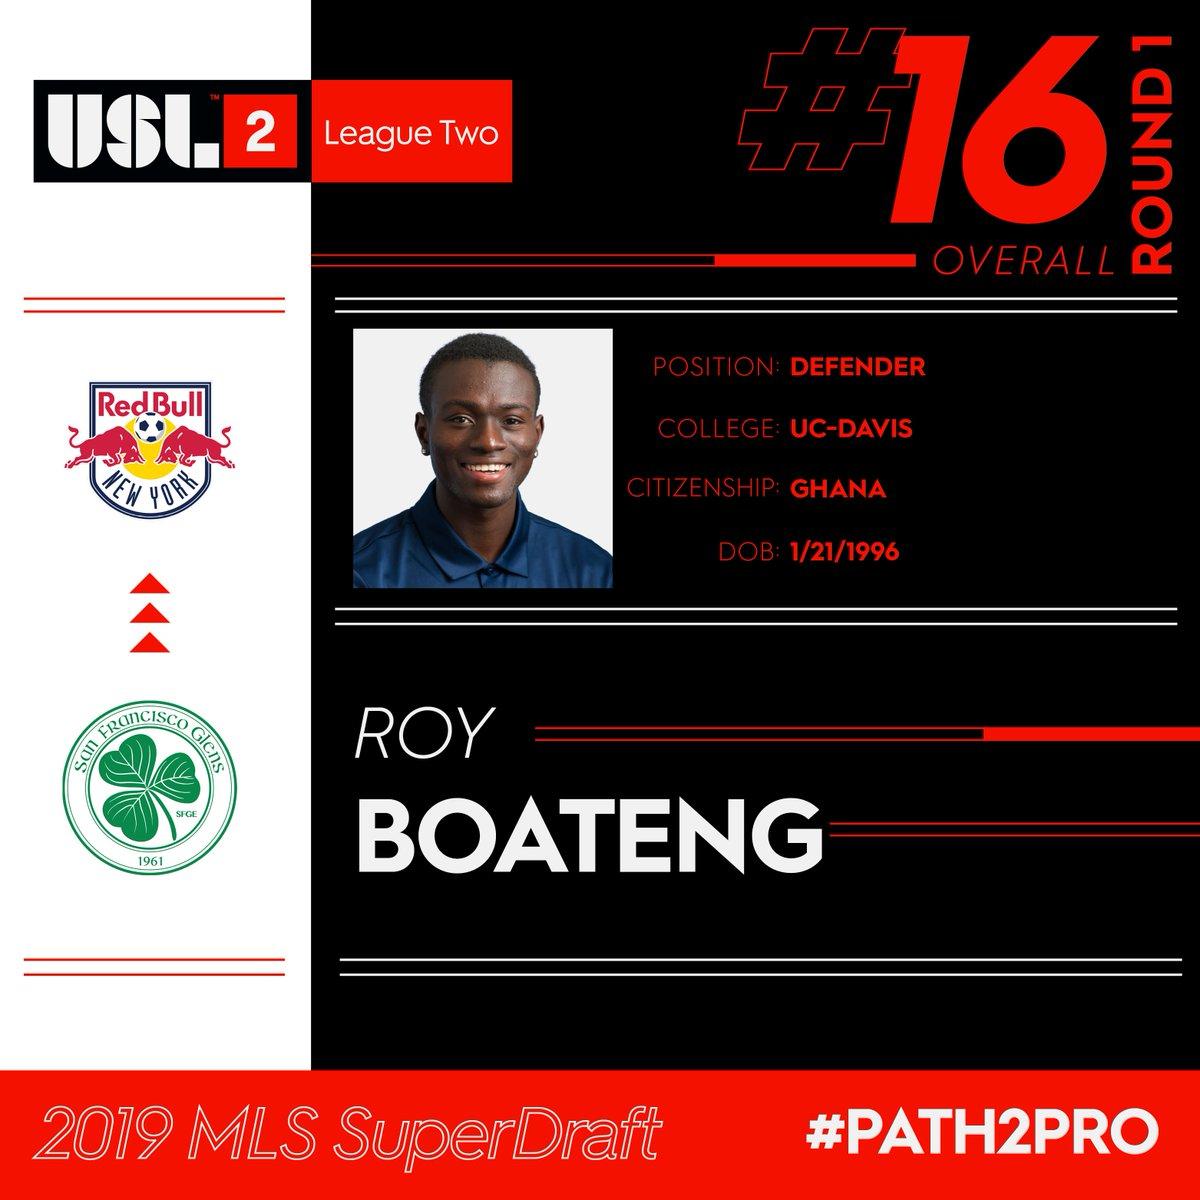 USL League Two's photo on Roy Boateng